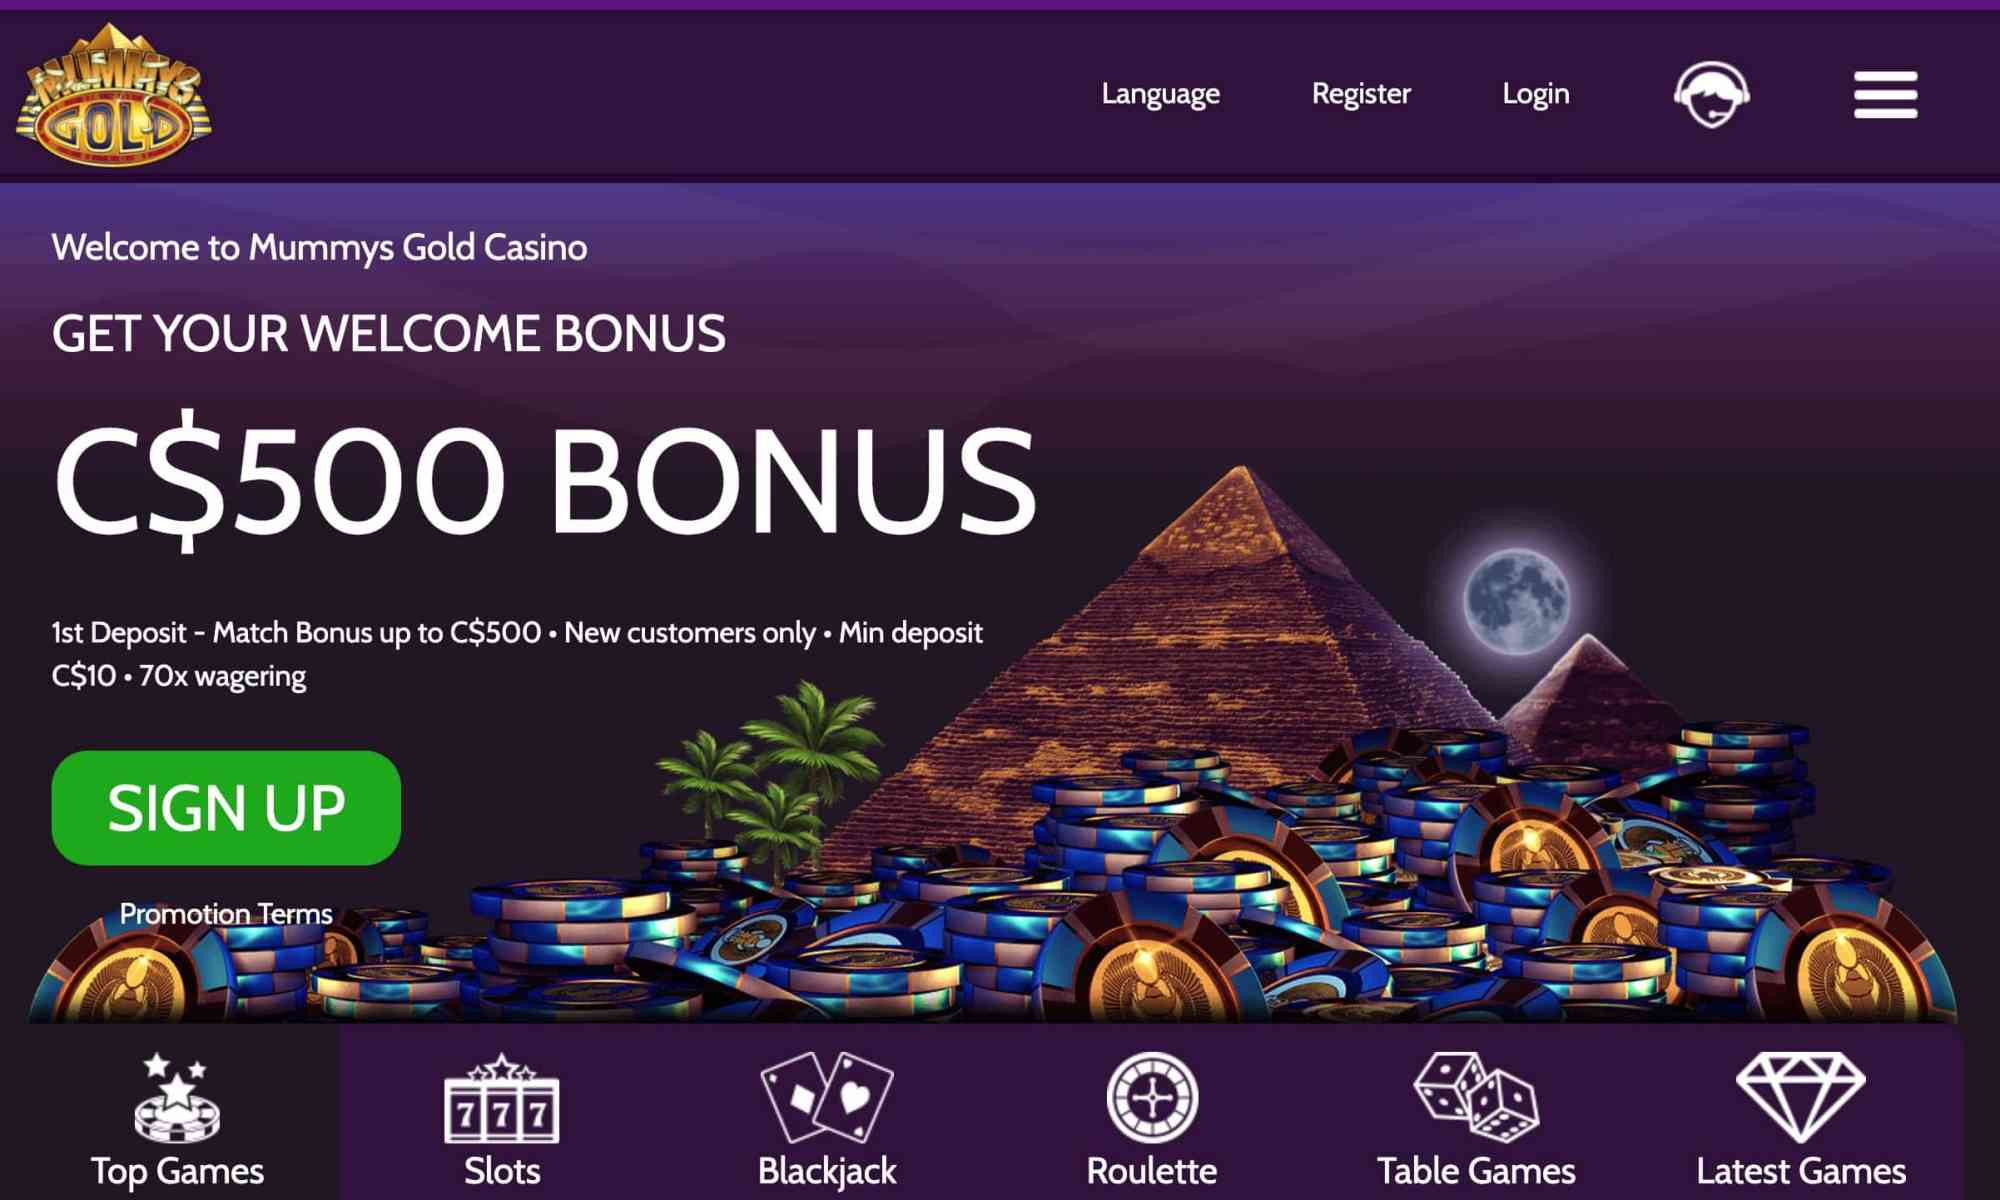 Mummys Gold Casino - 100% deposit bonus up to $500 bonus